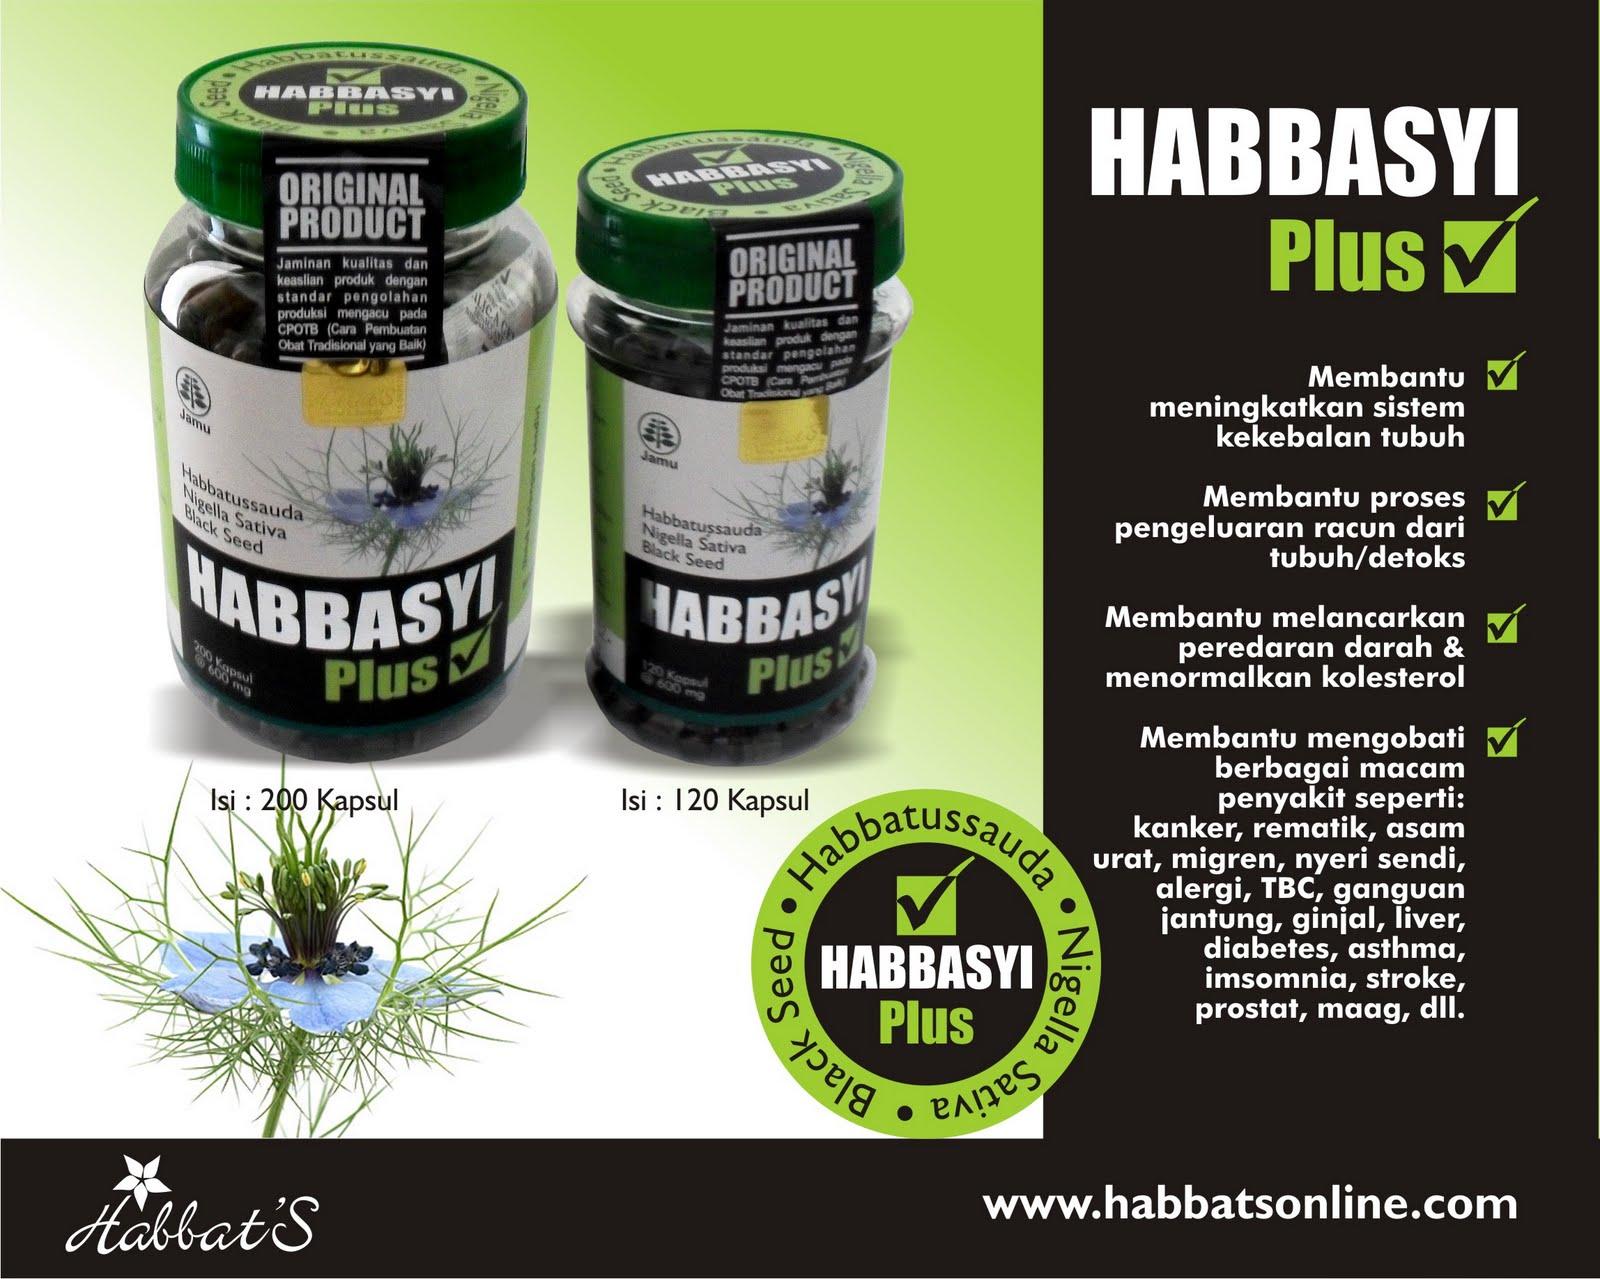 Rumah Herbal Rizqi Fakta Thibbun Nabawi Habbatus Sauda Madu Dan Habbatussauda Cap Kurma Ajwa 210kpsl Minyak Zaitun